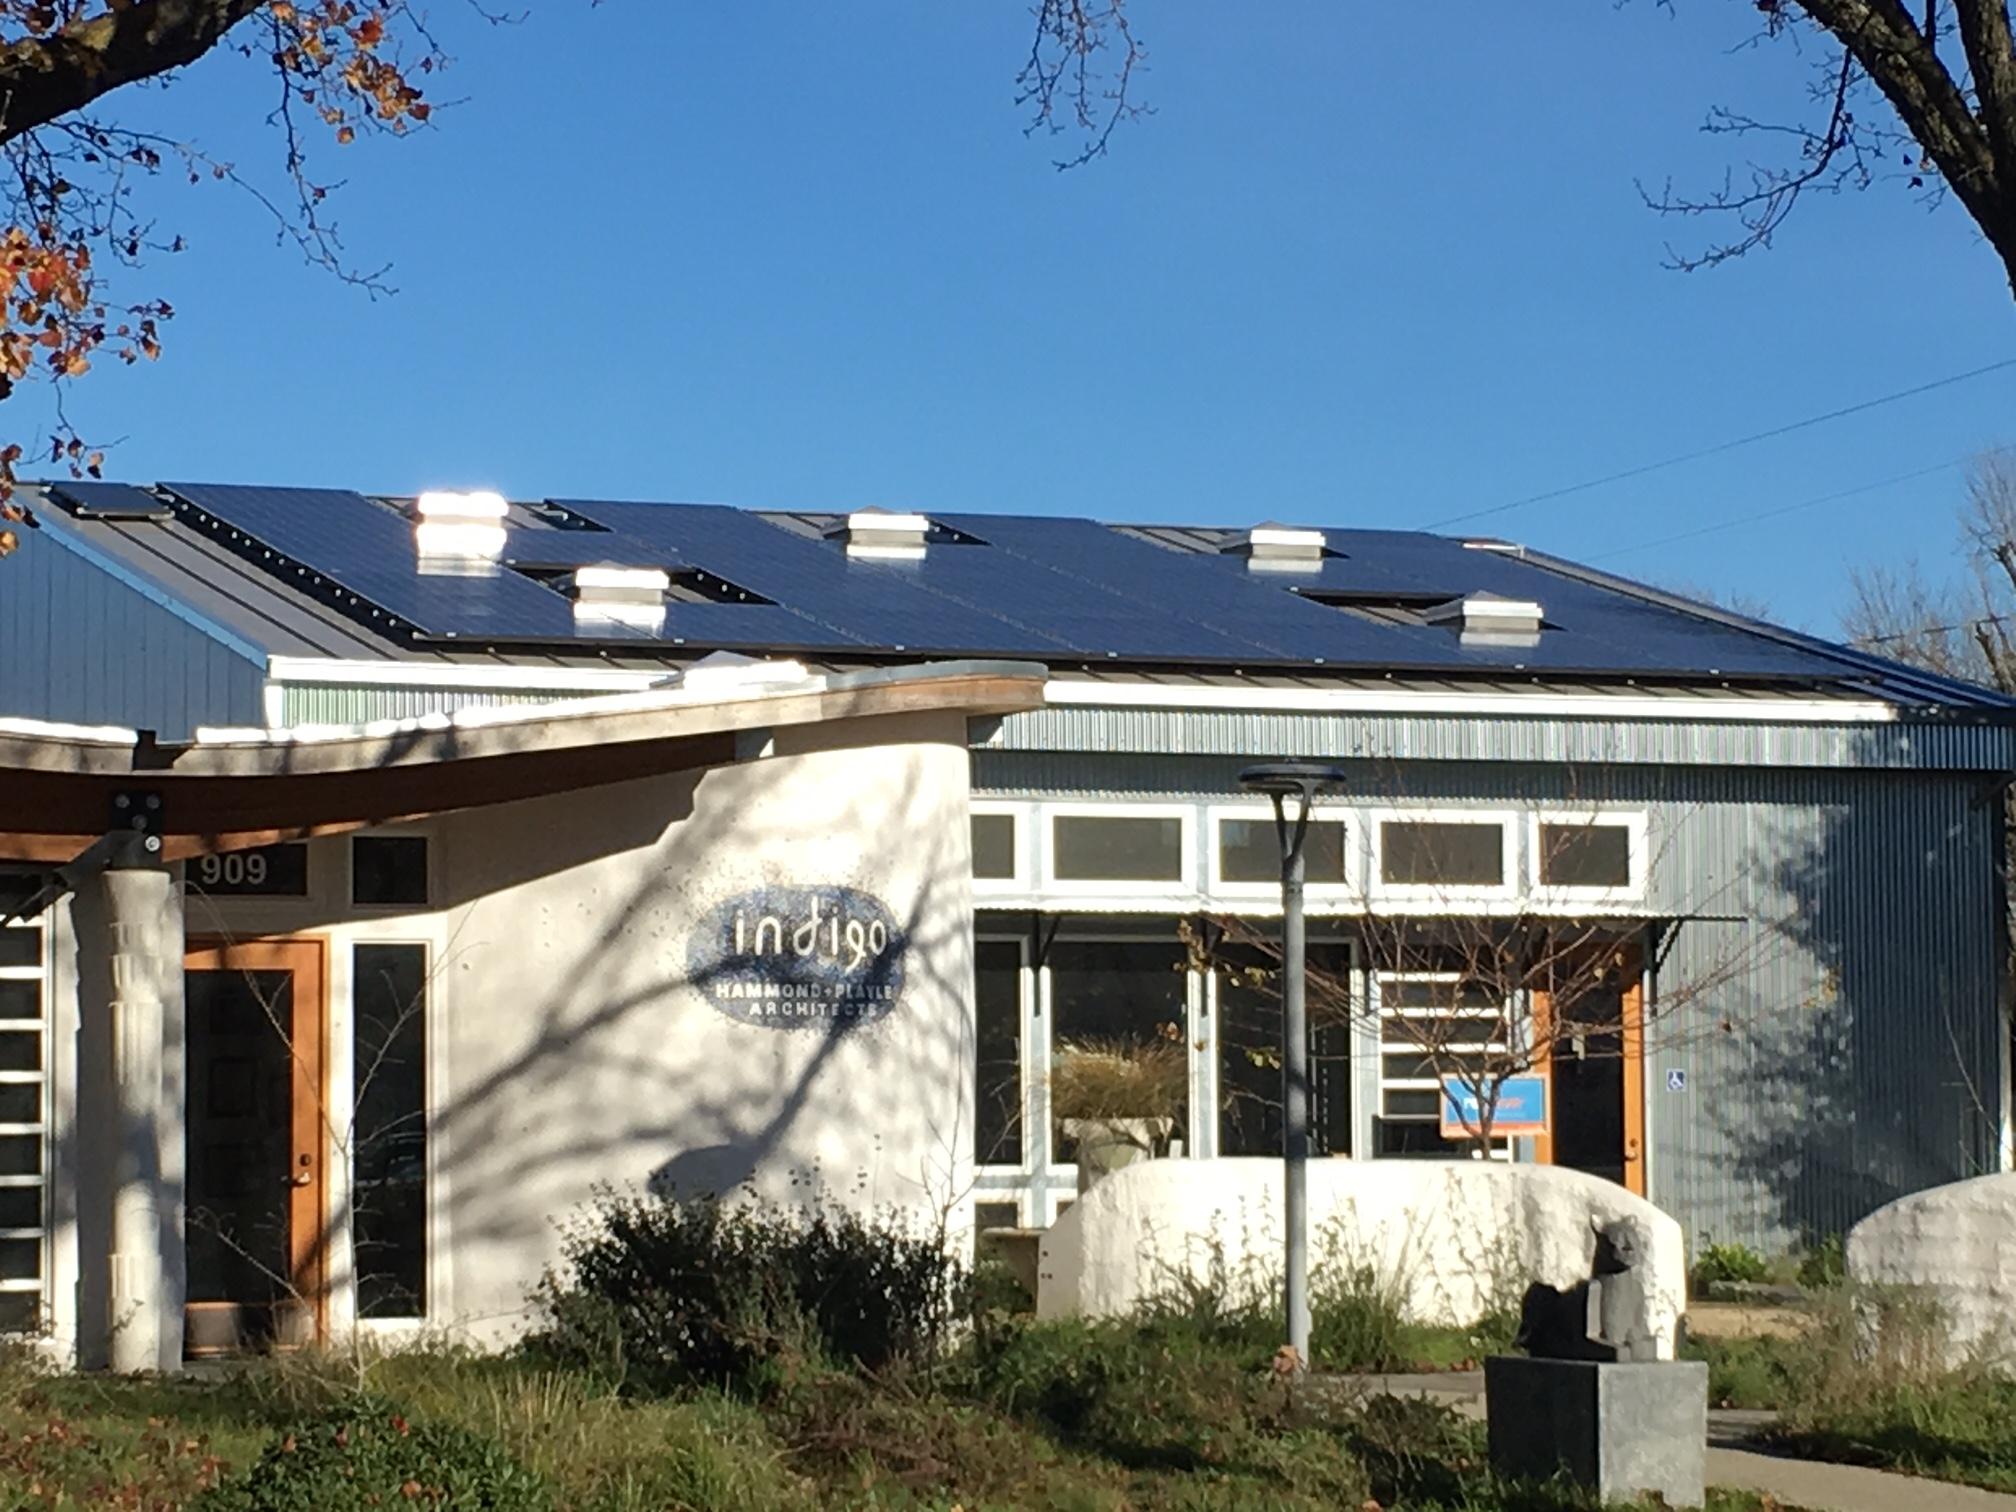 office w solar panels.JPG